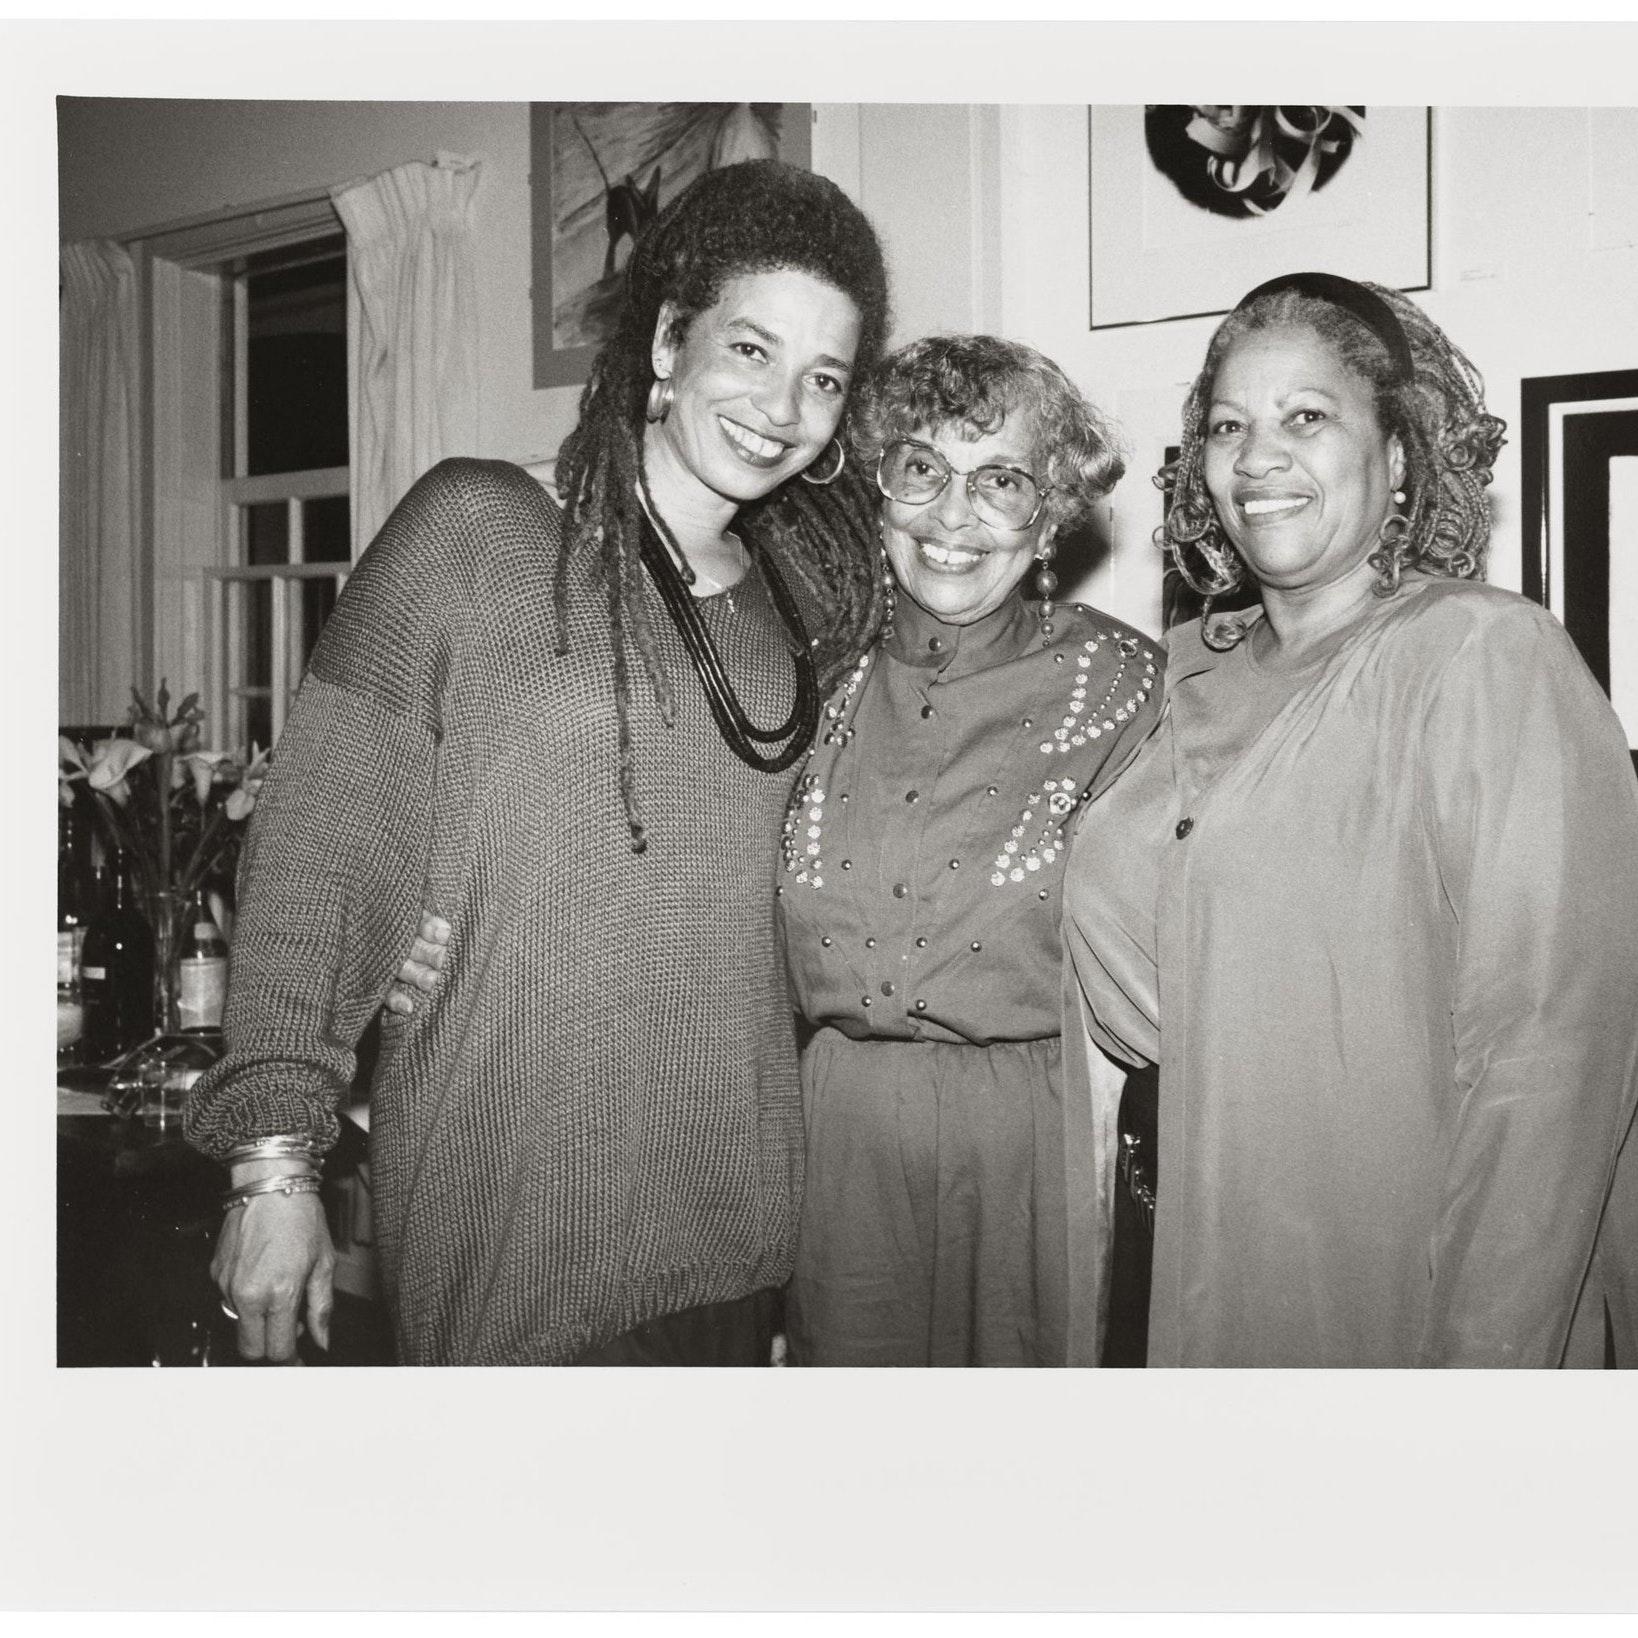 Black & white photograph of Toni Morrison, Sallye Davis, and Angela Davis.